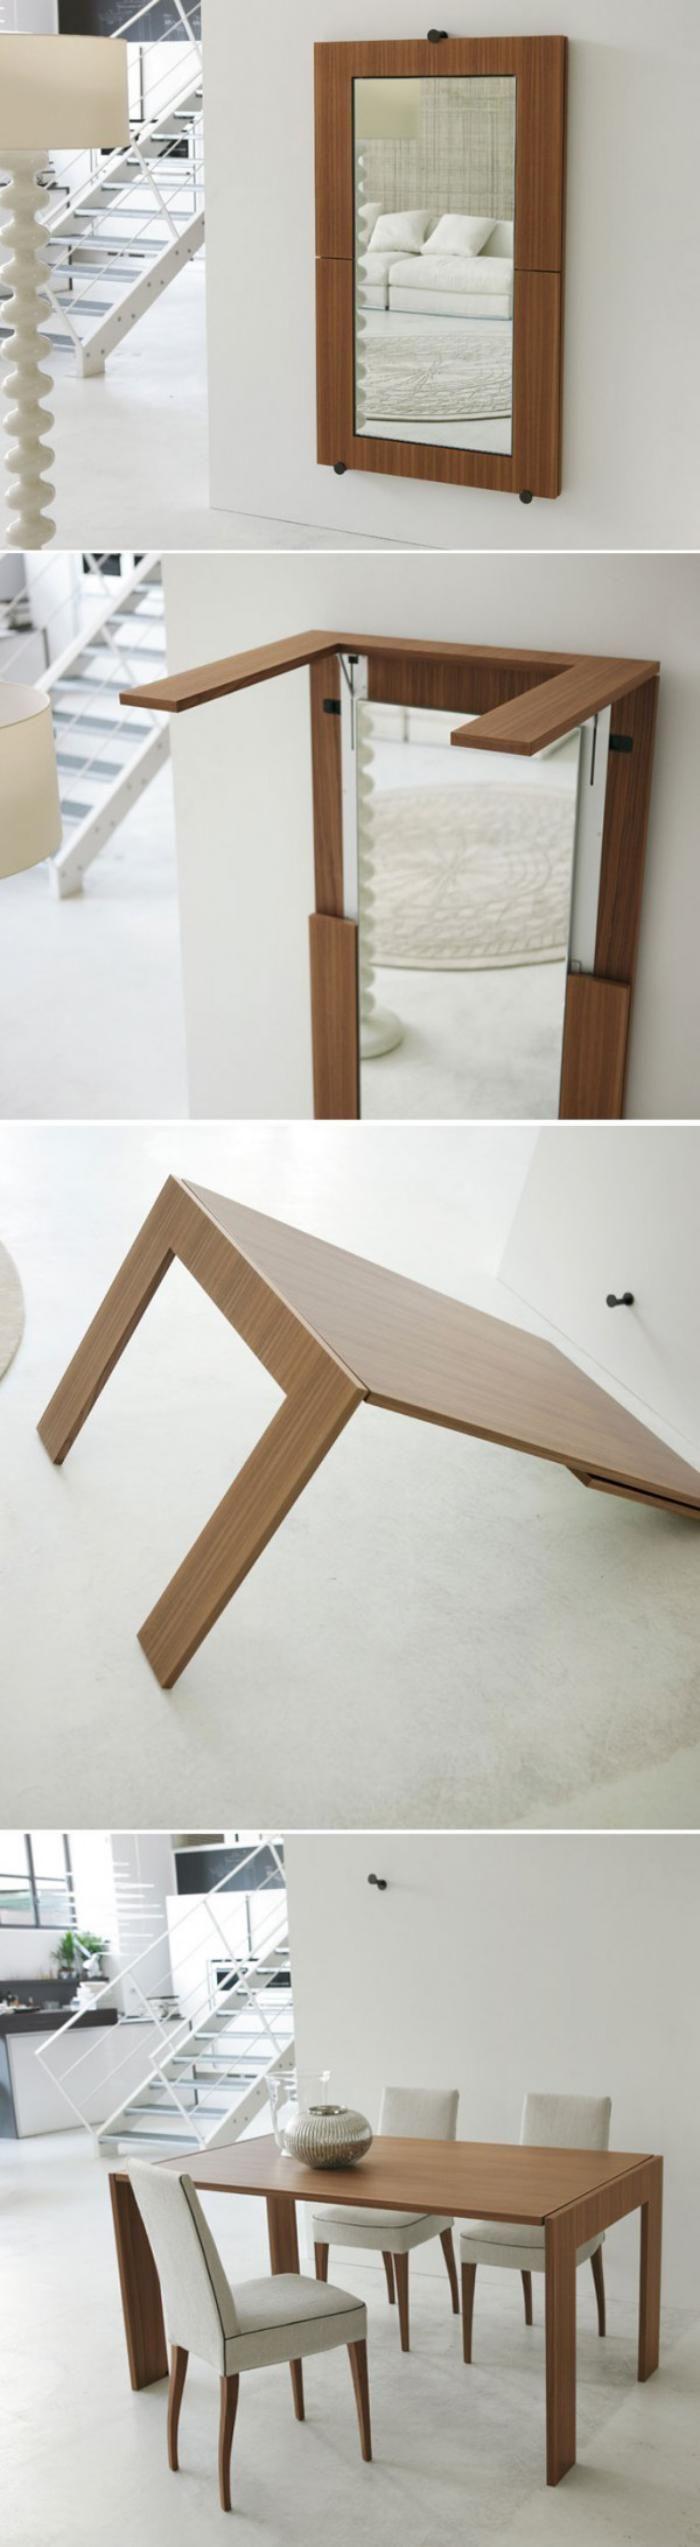 meuble gain de place original